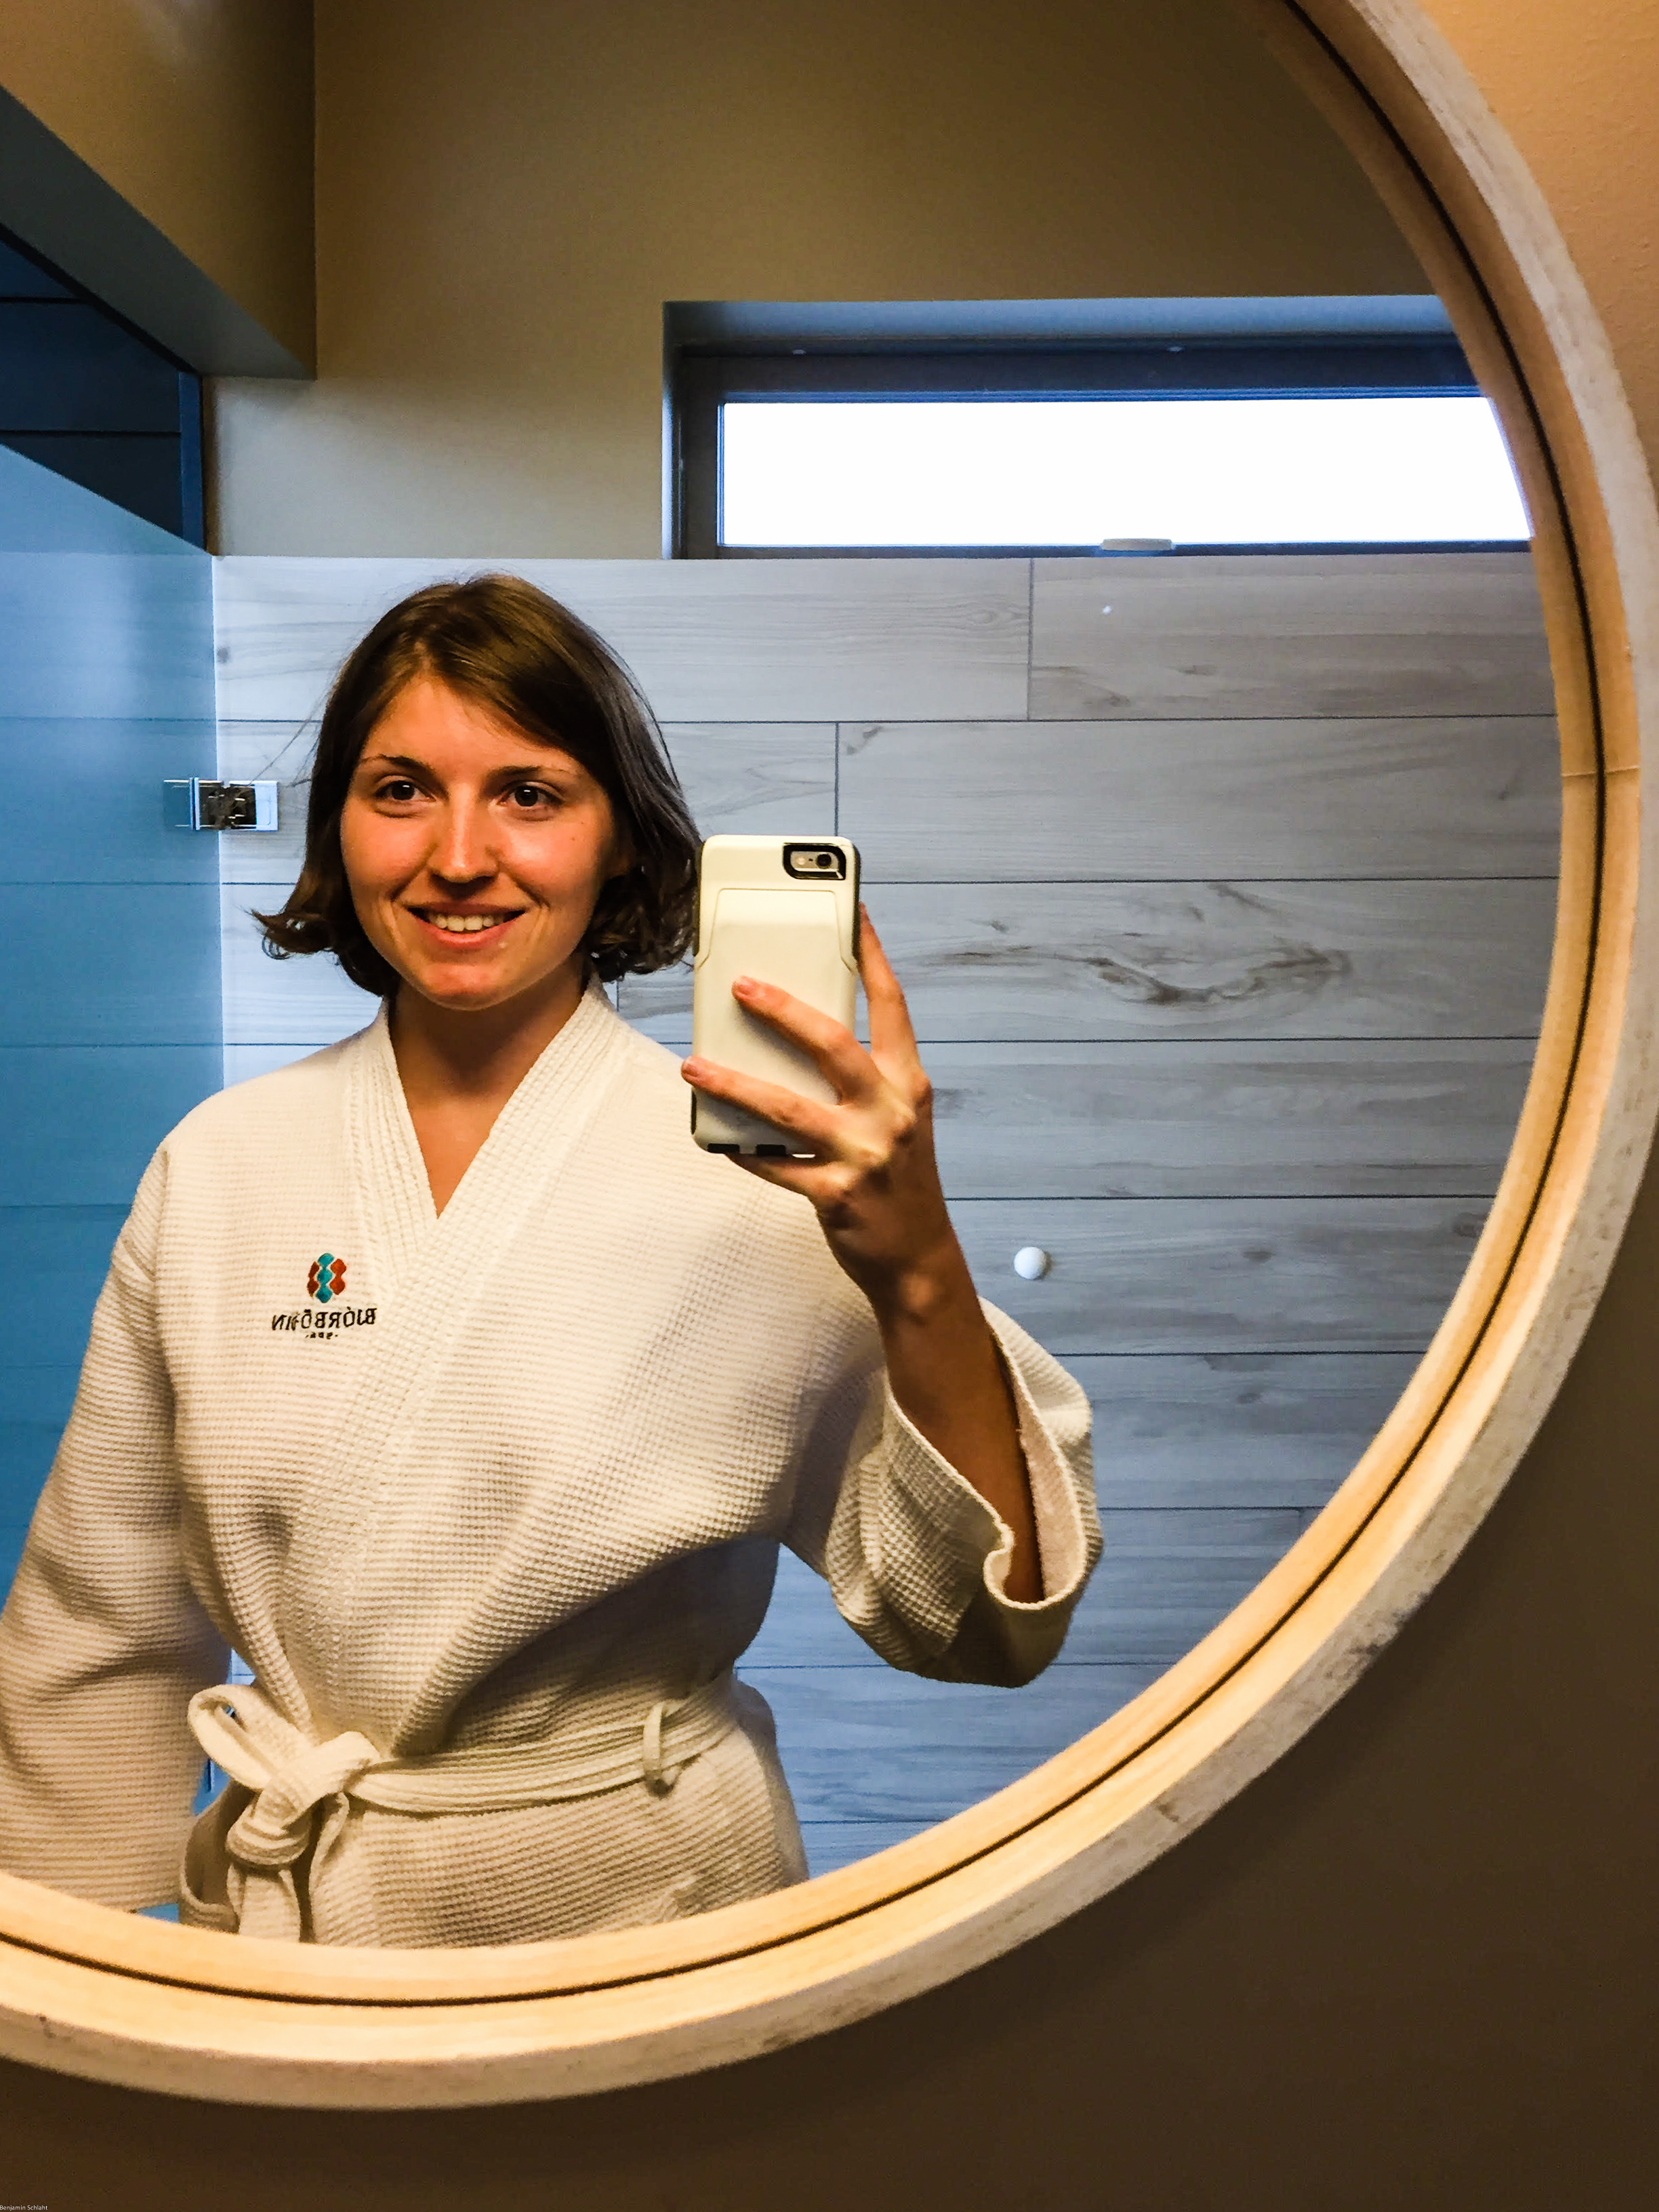 Mrs. Nerd in her robe, loving the huge mirror in the dressing room